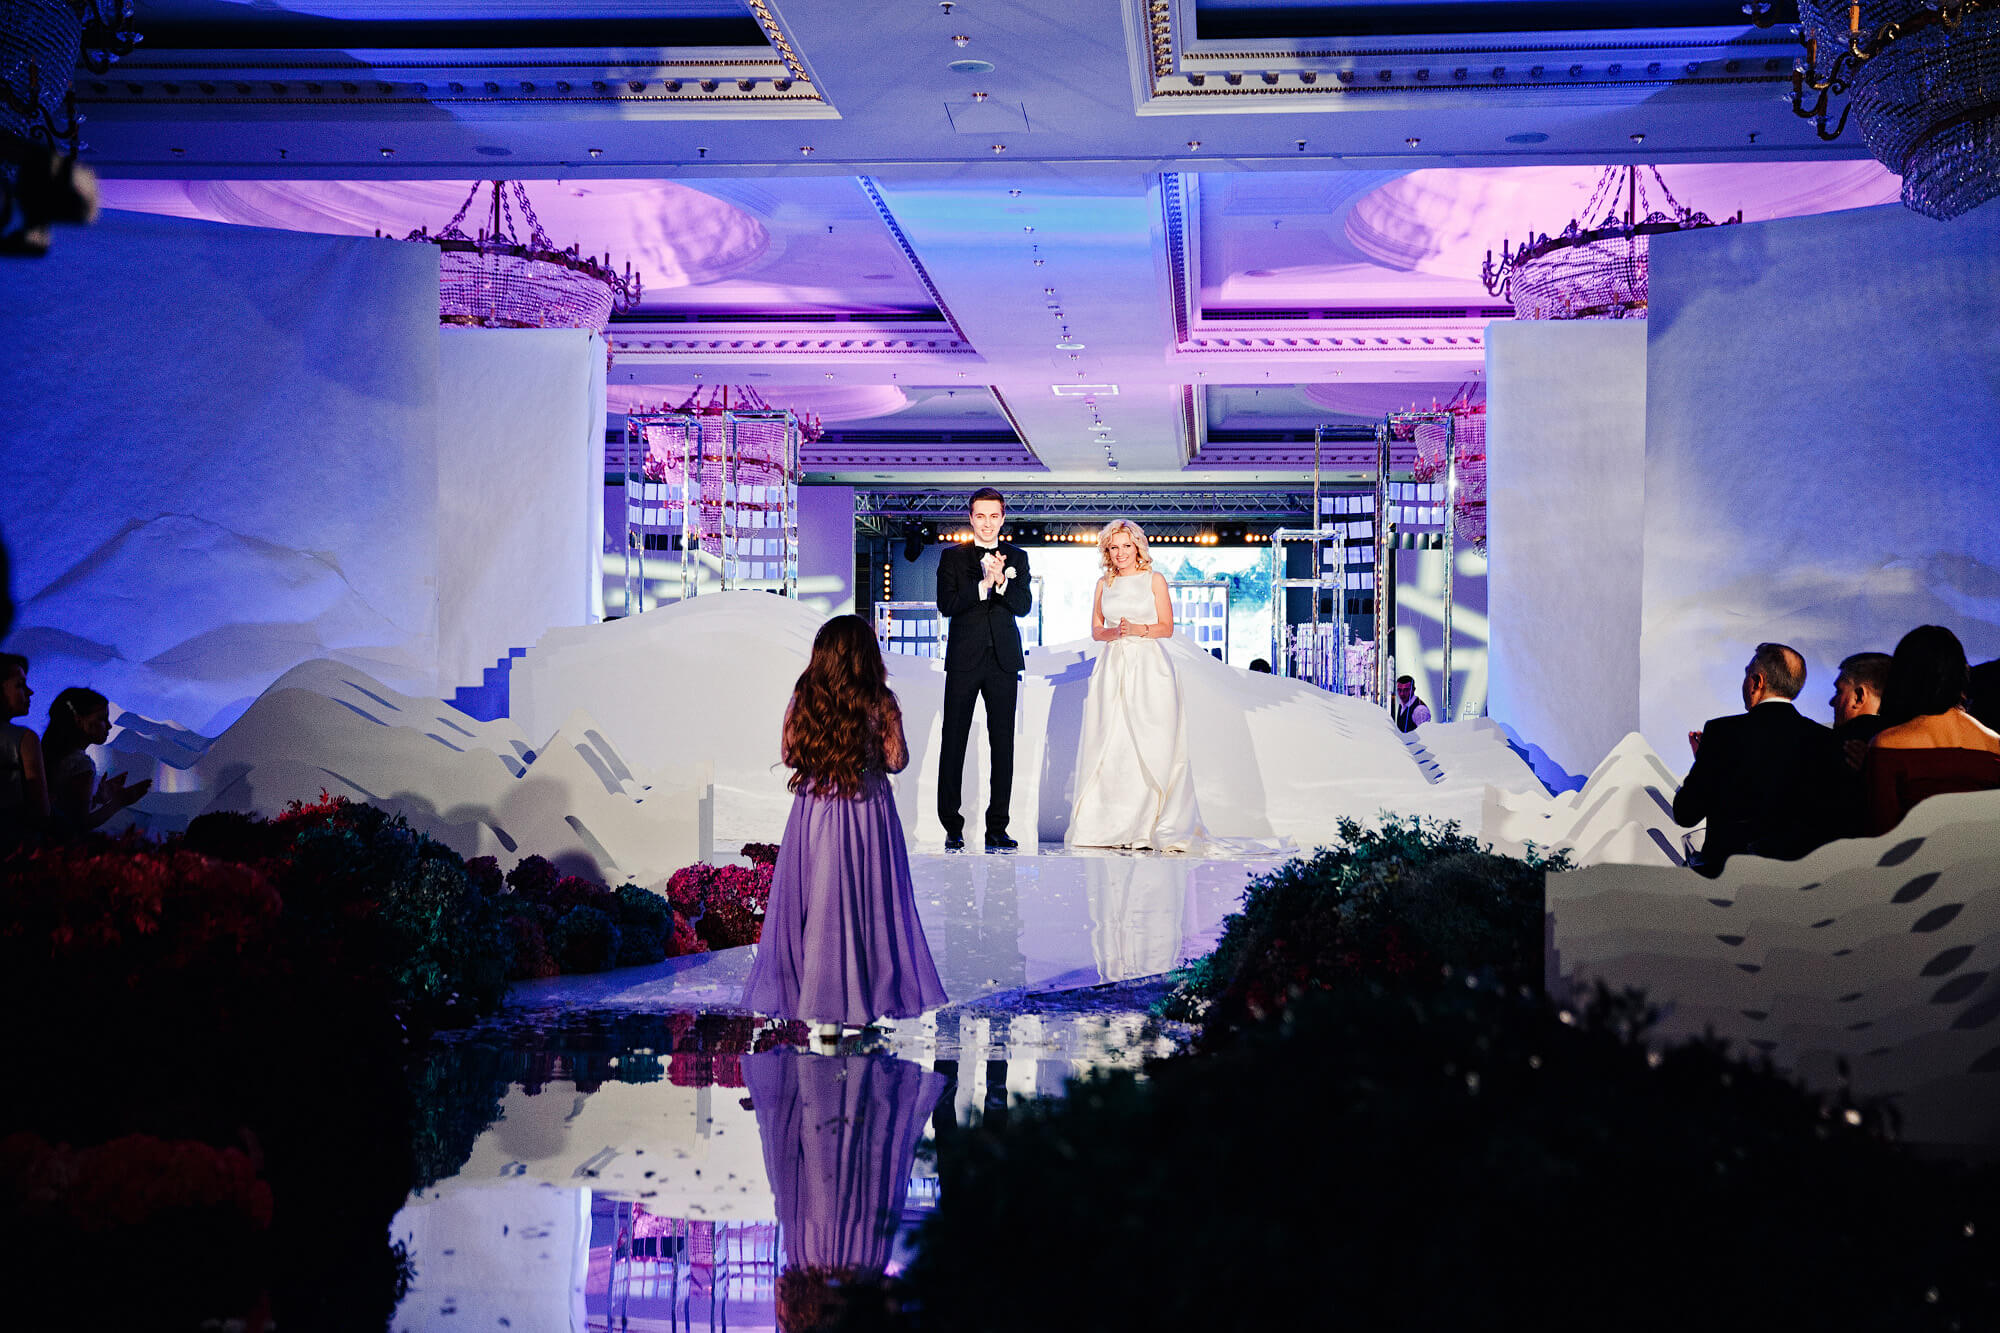 Свадебная церемония в Ритц Карлтон. BM Weddings & Events